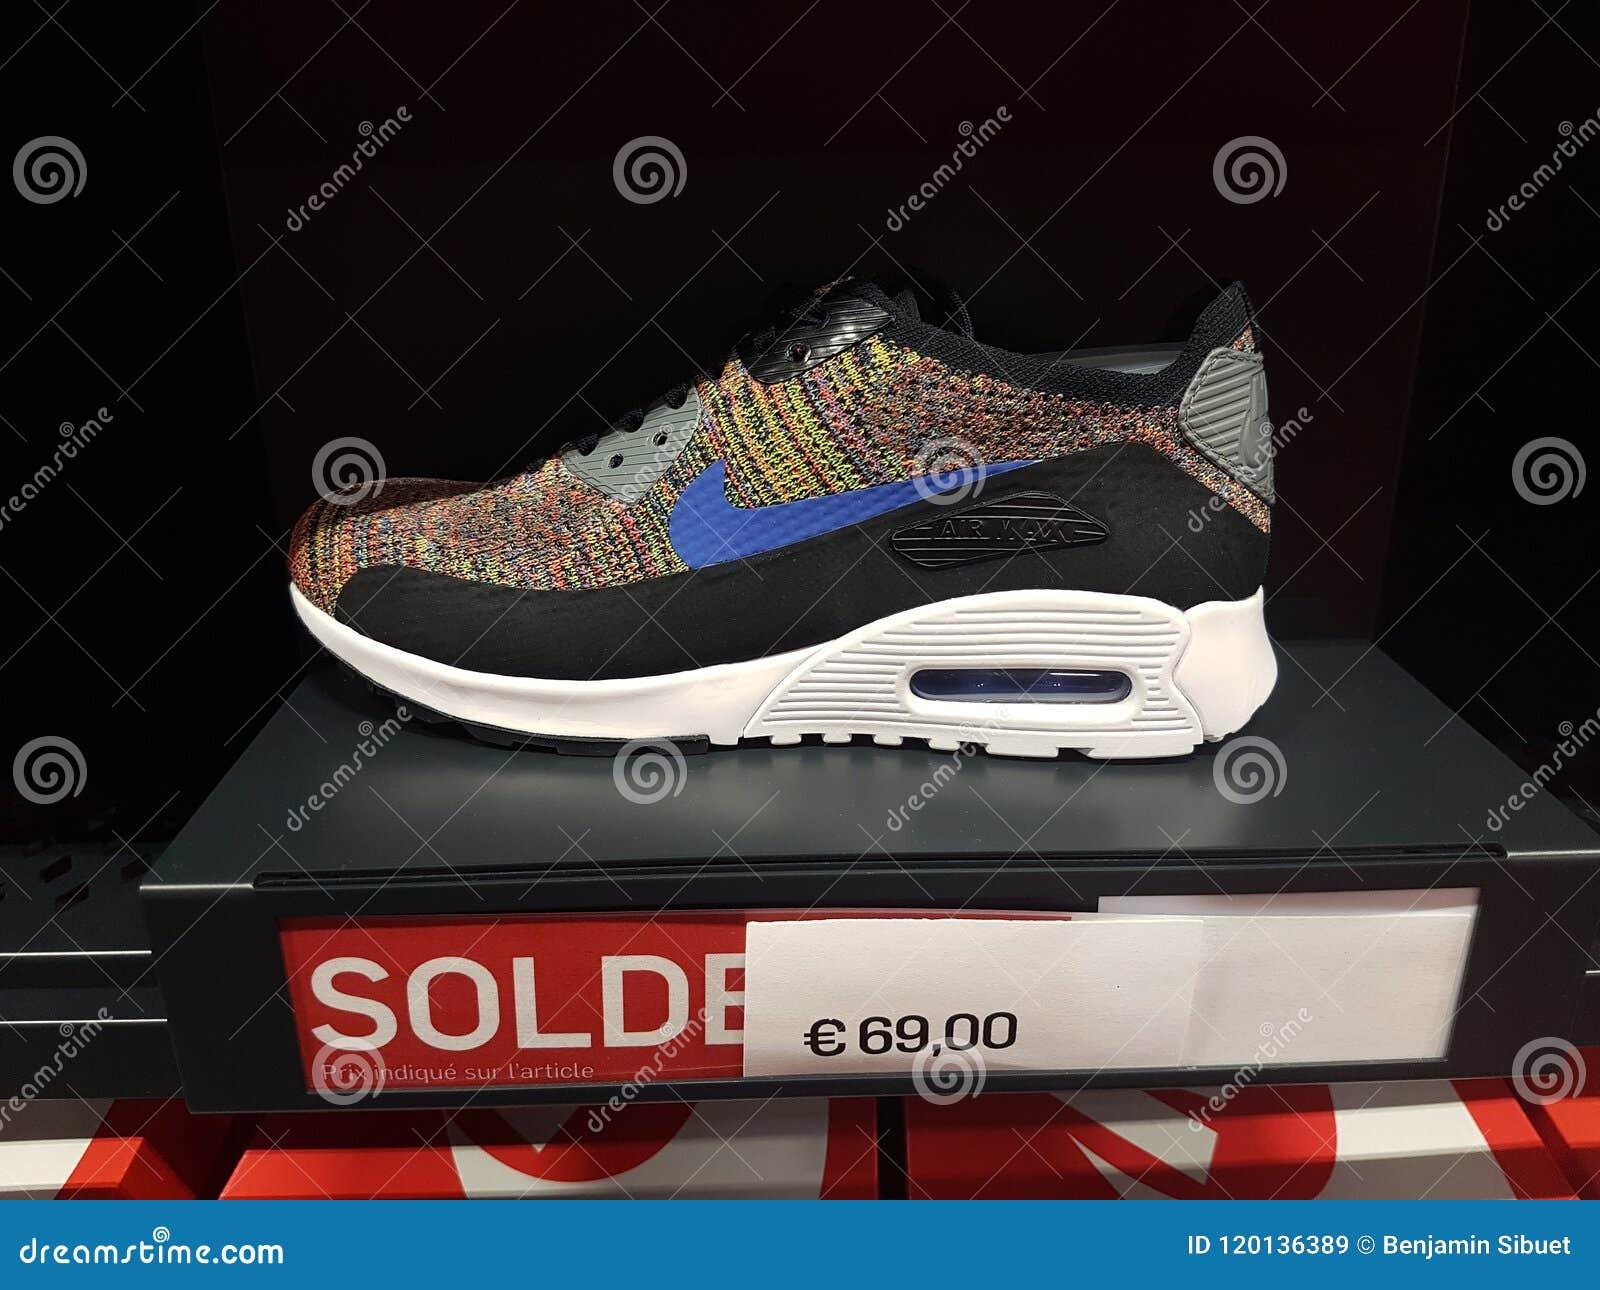 Nike Shoes Display Stock Photos & Nike Shoes Display Stock